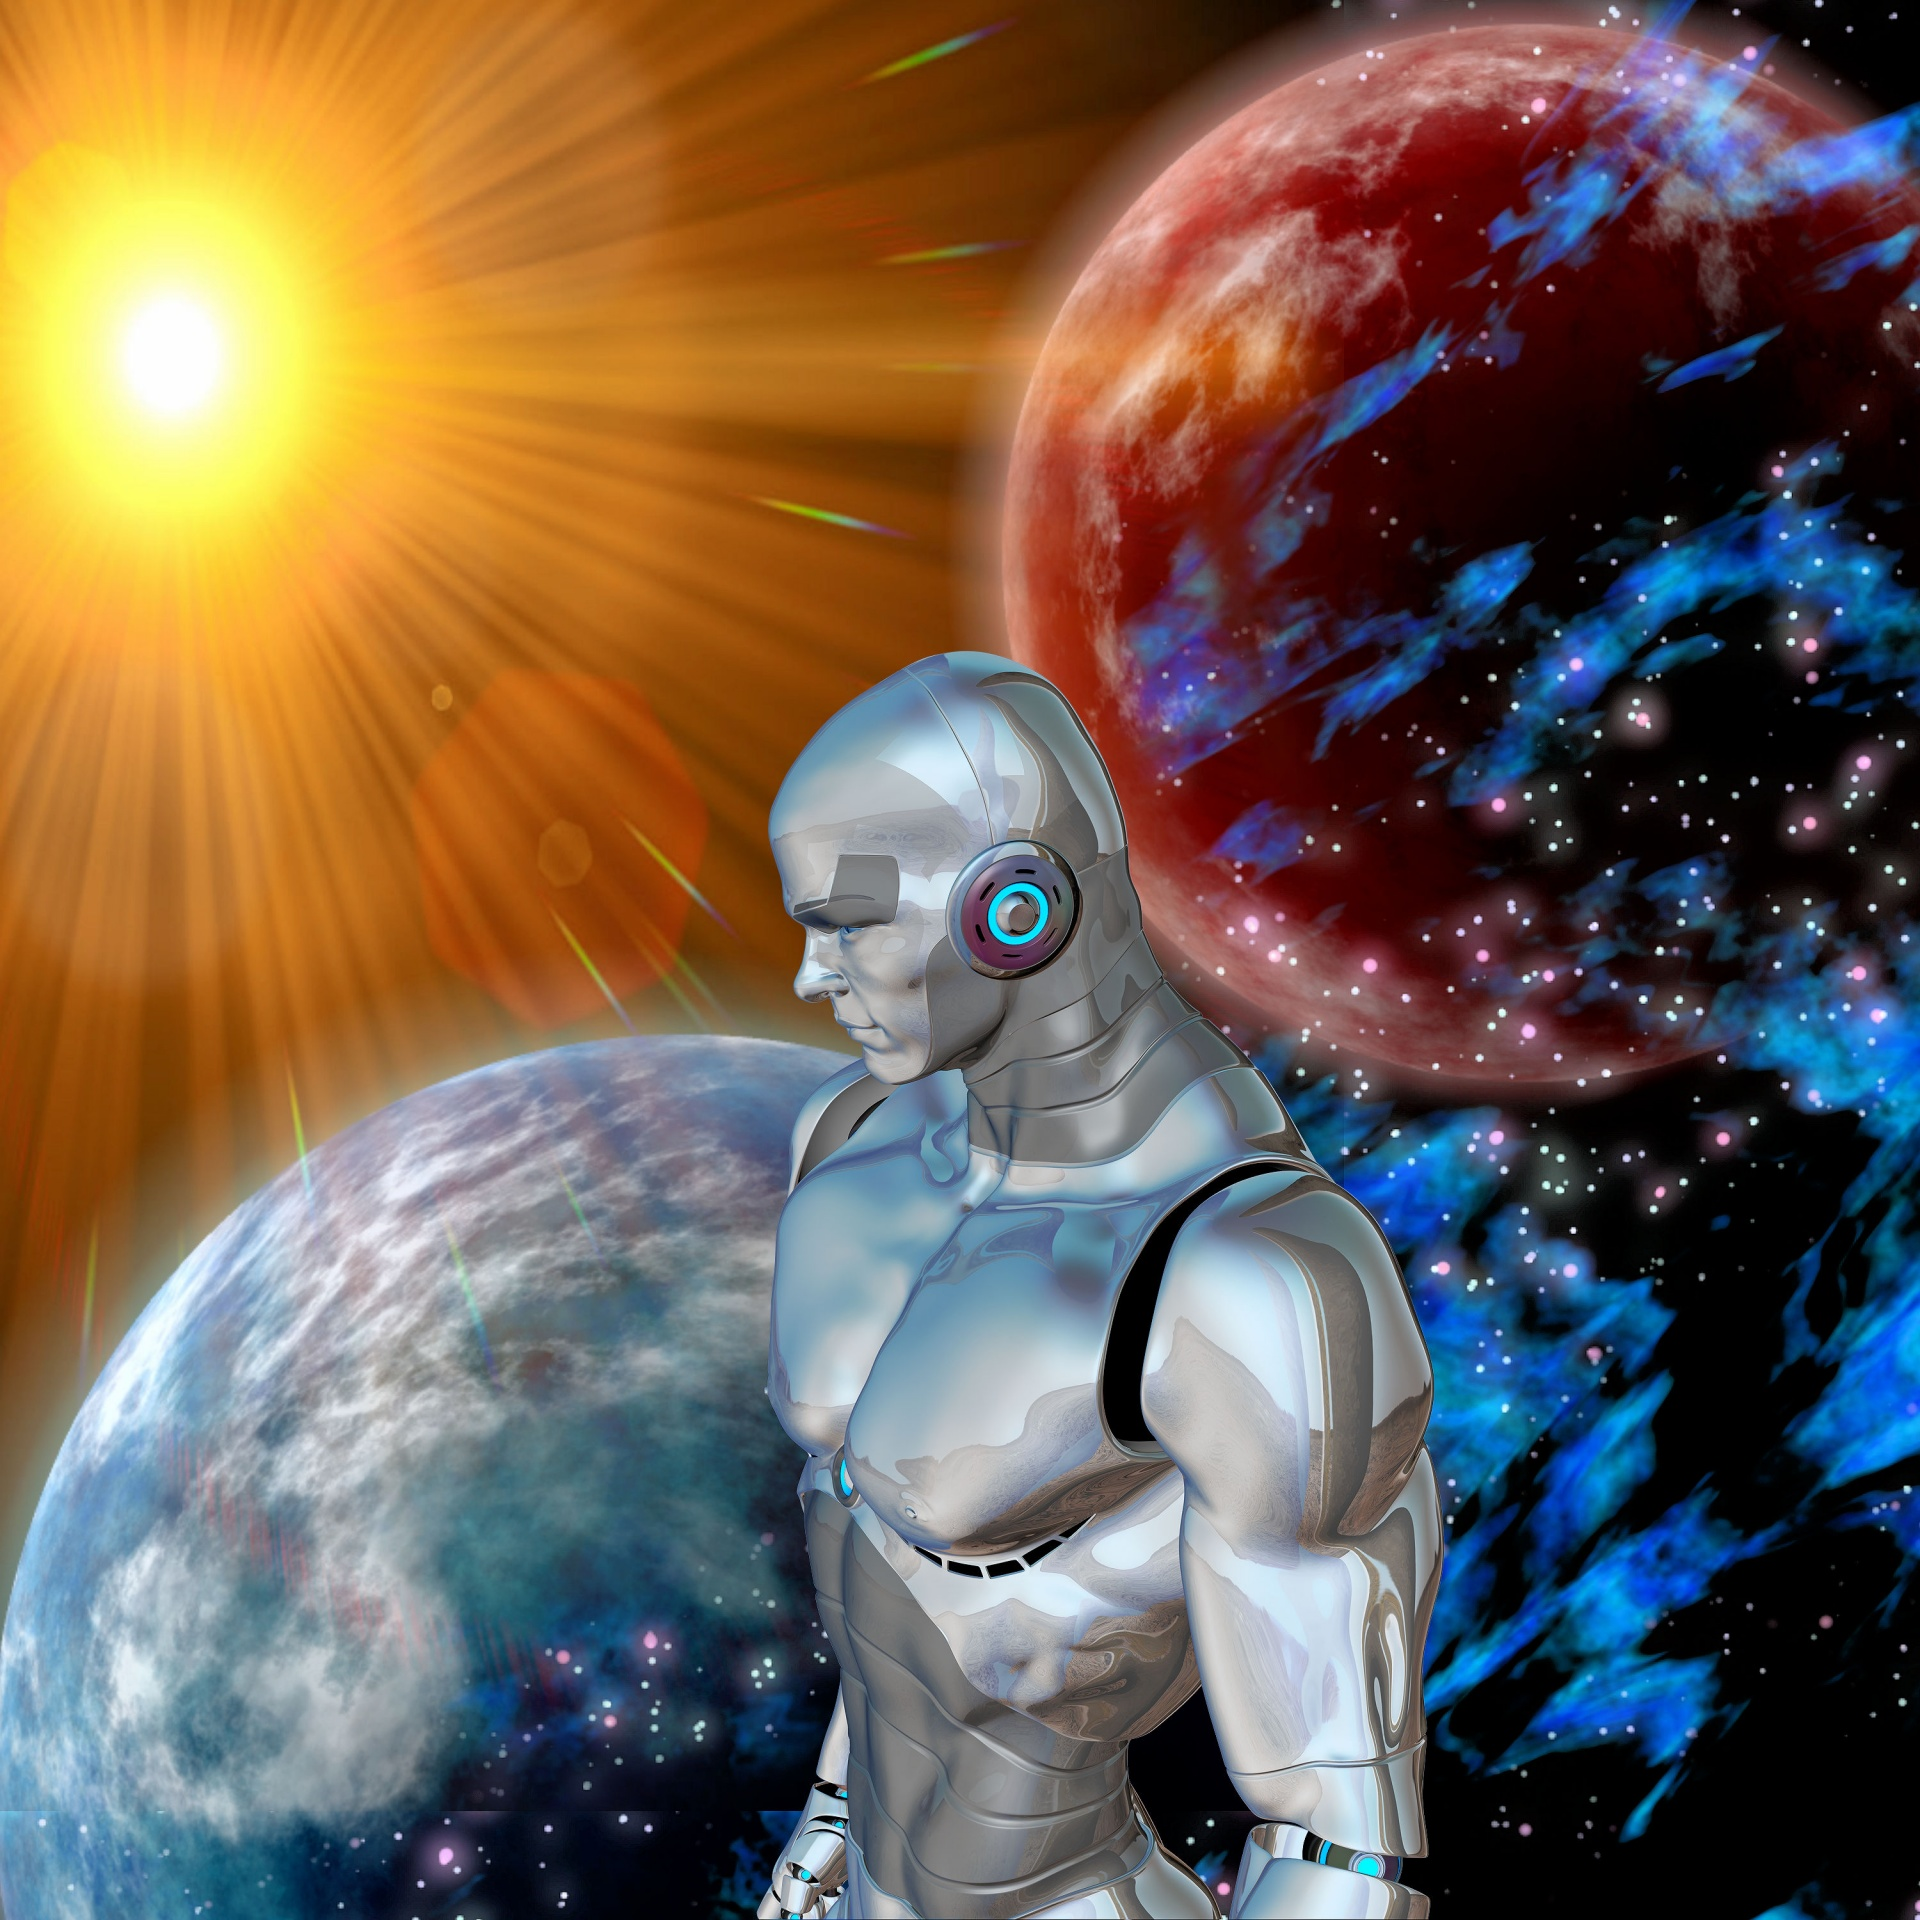 Robot, Technology, Universe, Innovation, Vision